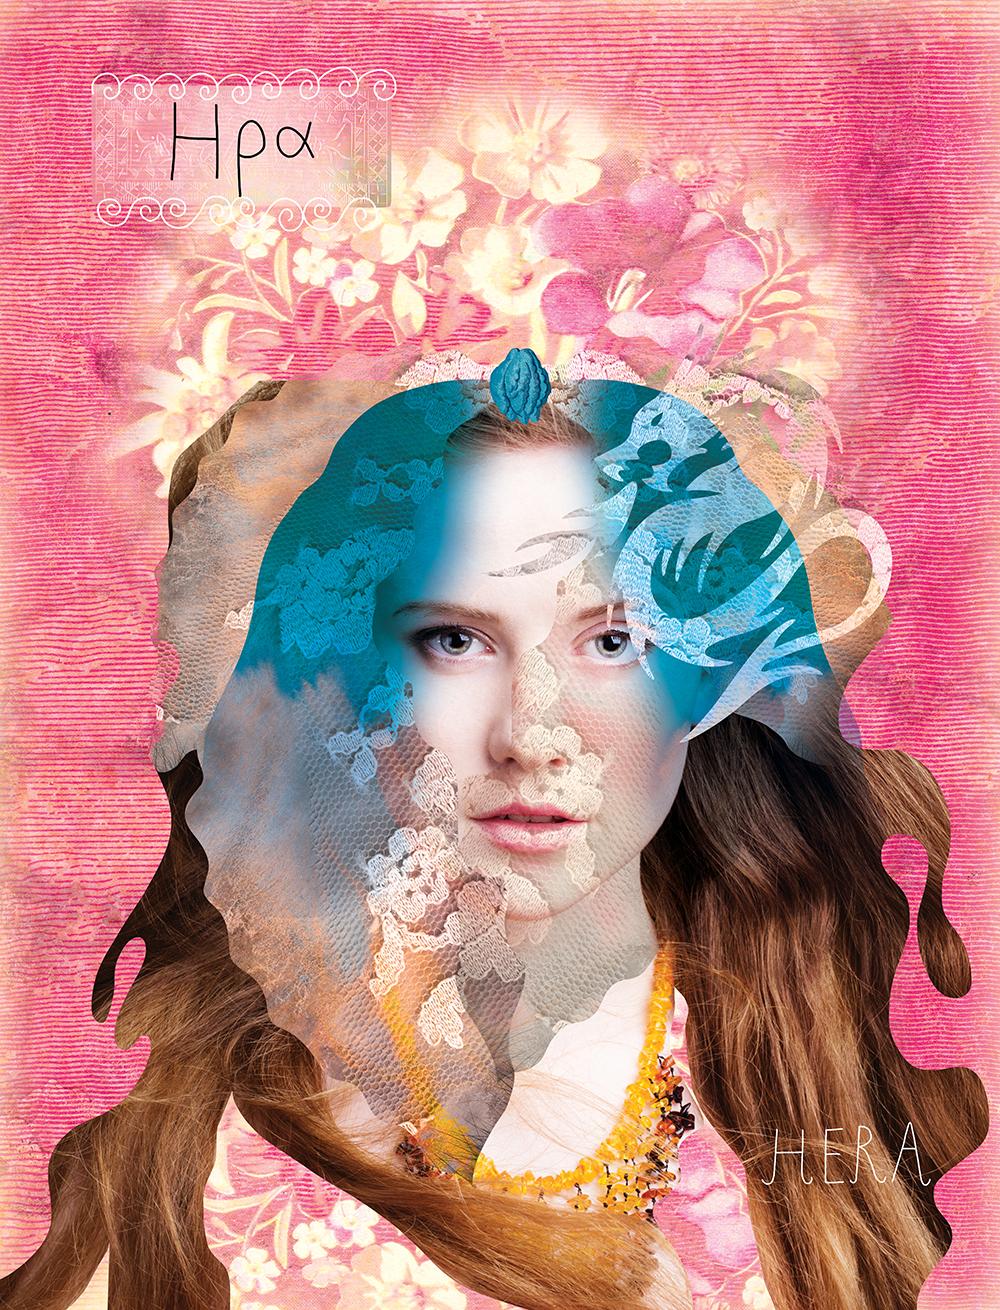 Hera by Marenthe.jpg